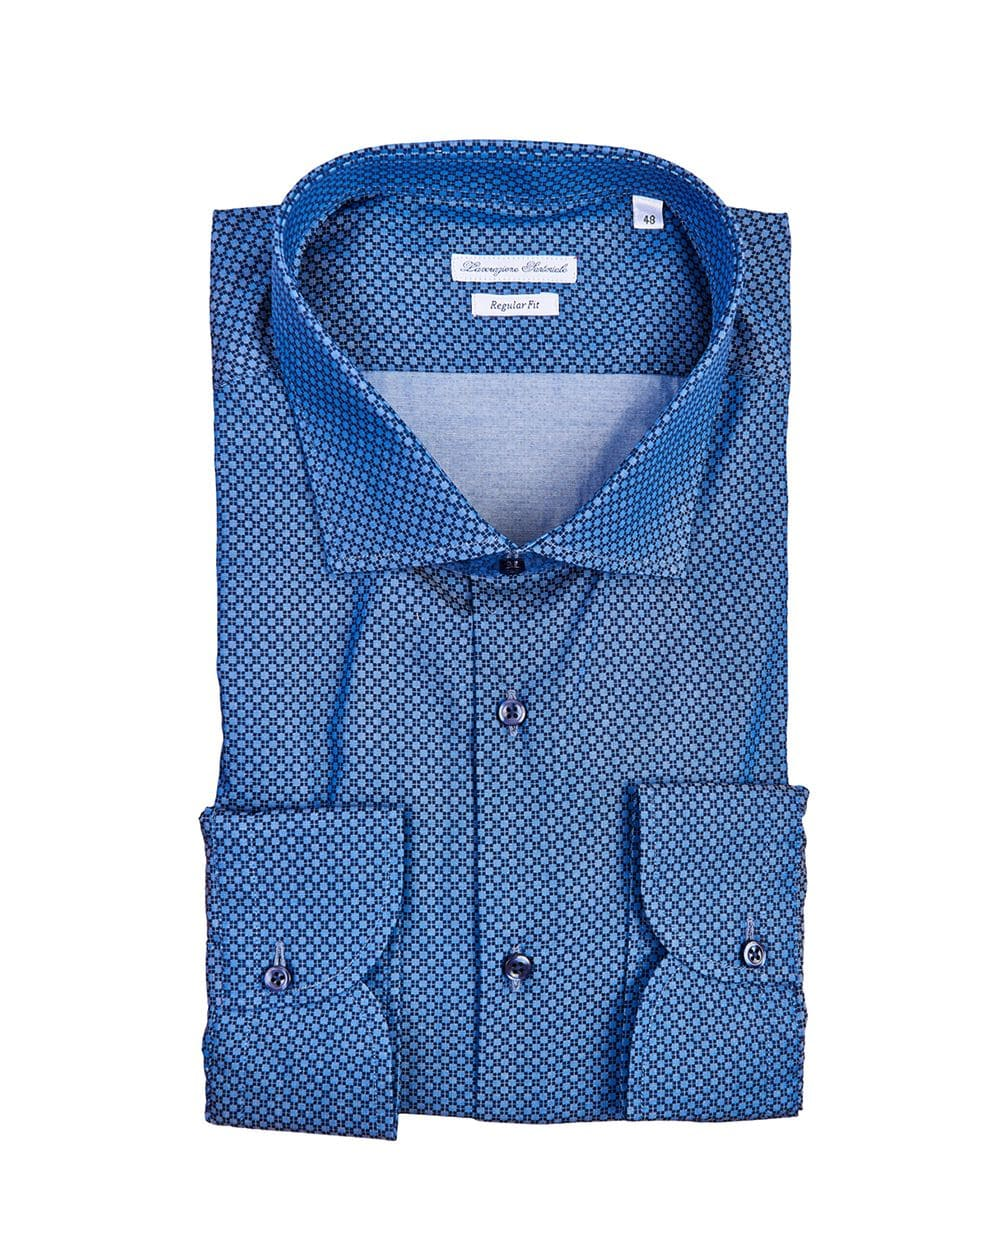 Lavorazione Sartoriale мужская одежда